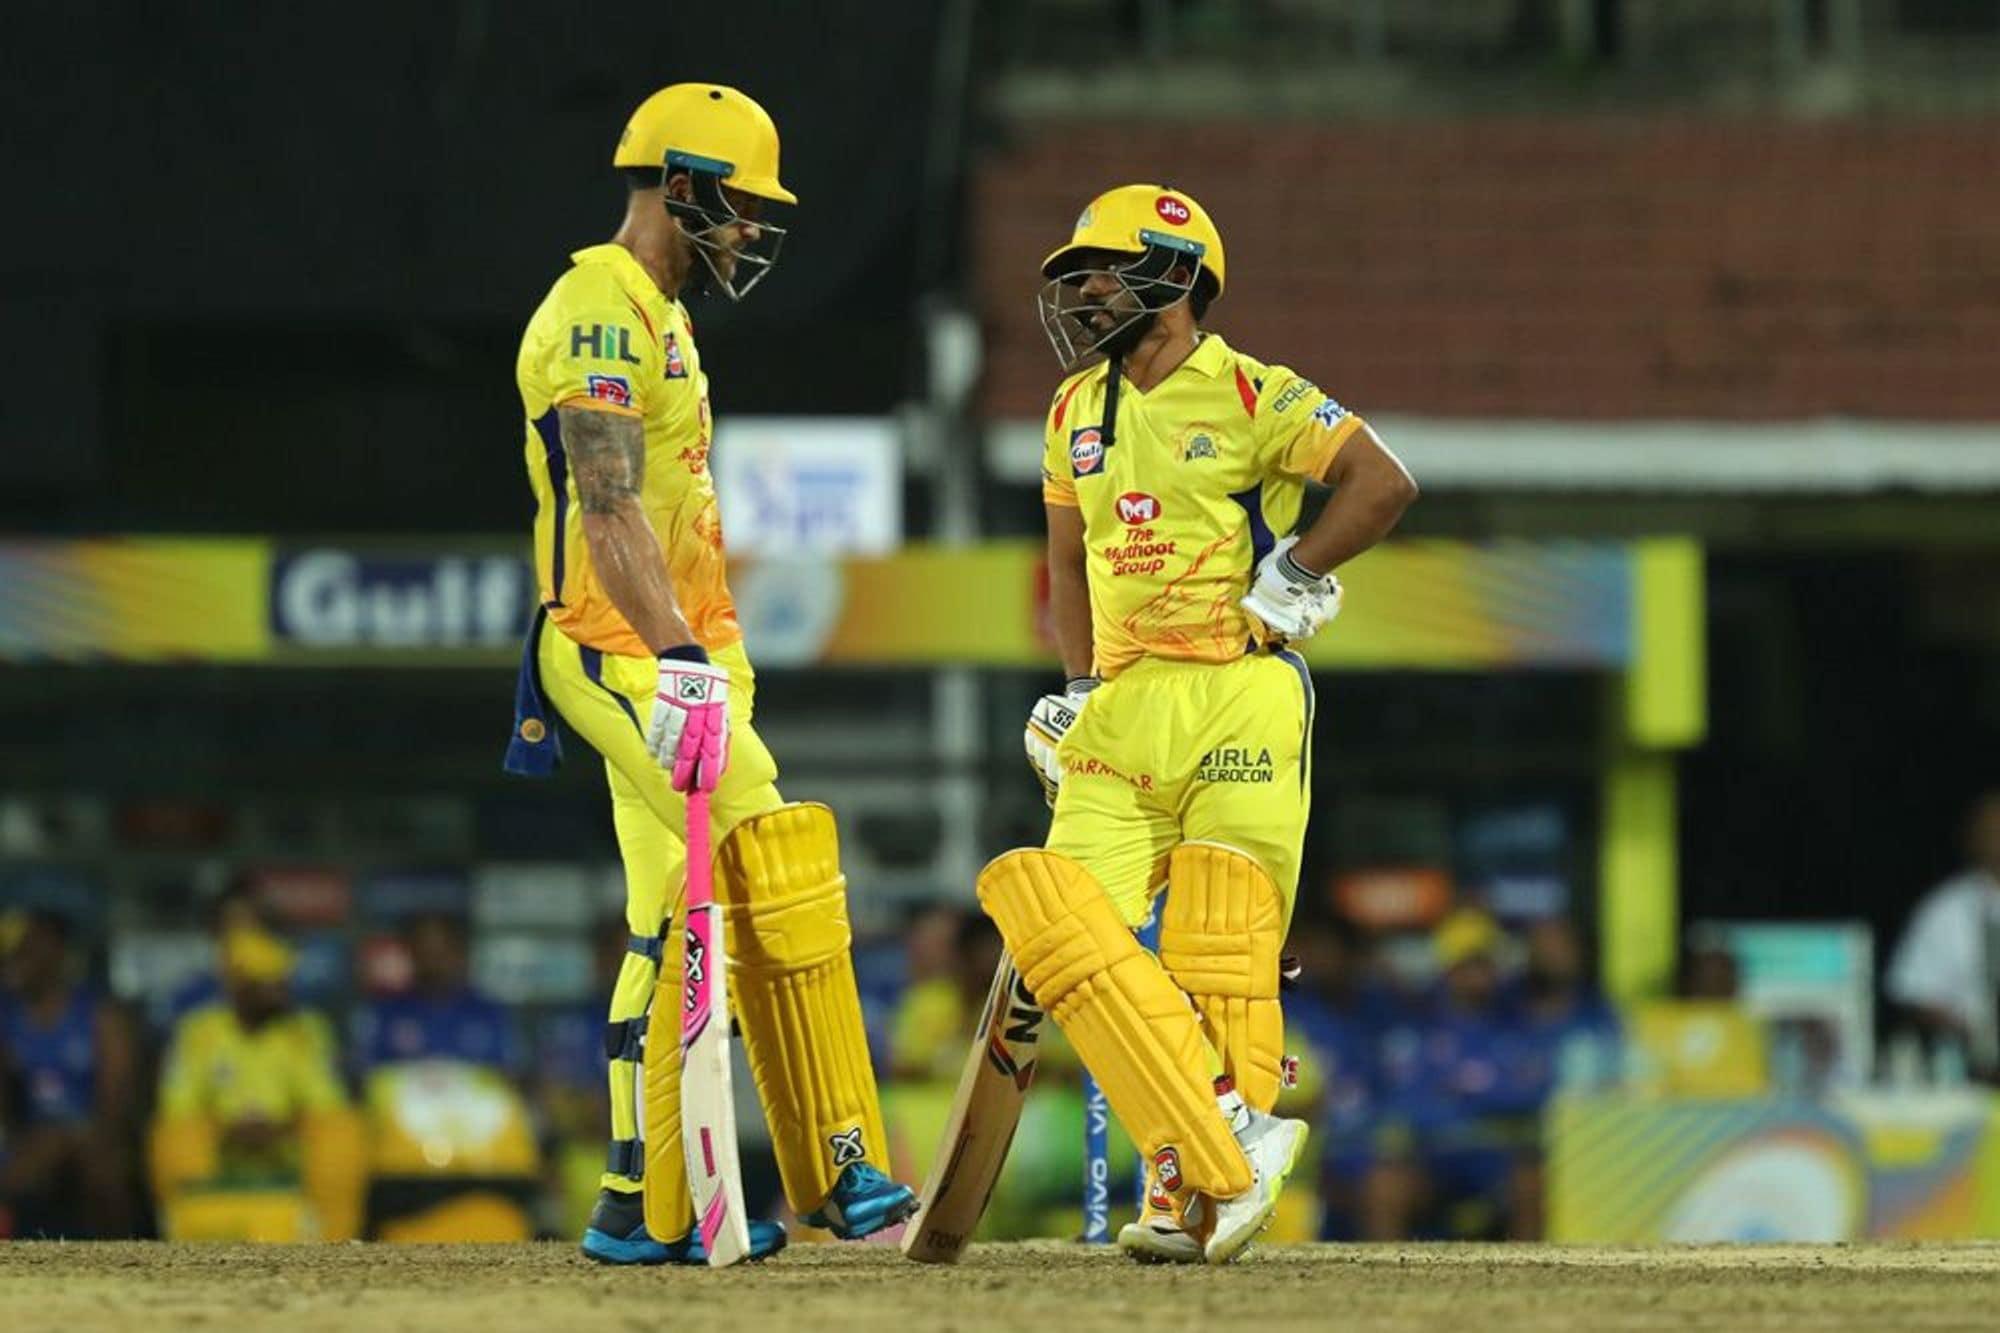 In Pics, Match 23, Chennai Super Kings vs Kolkata Knight Riders